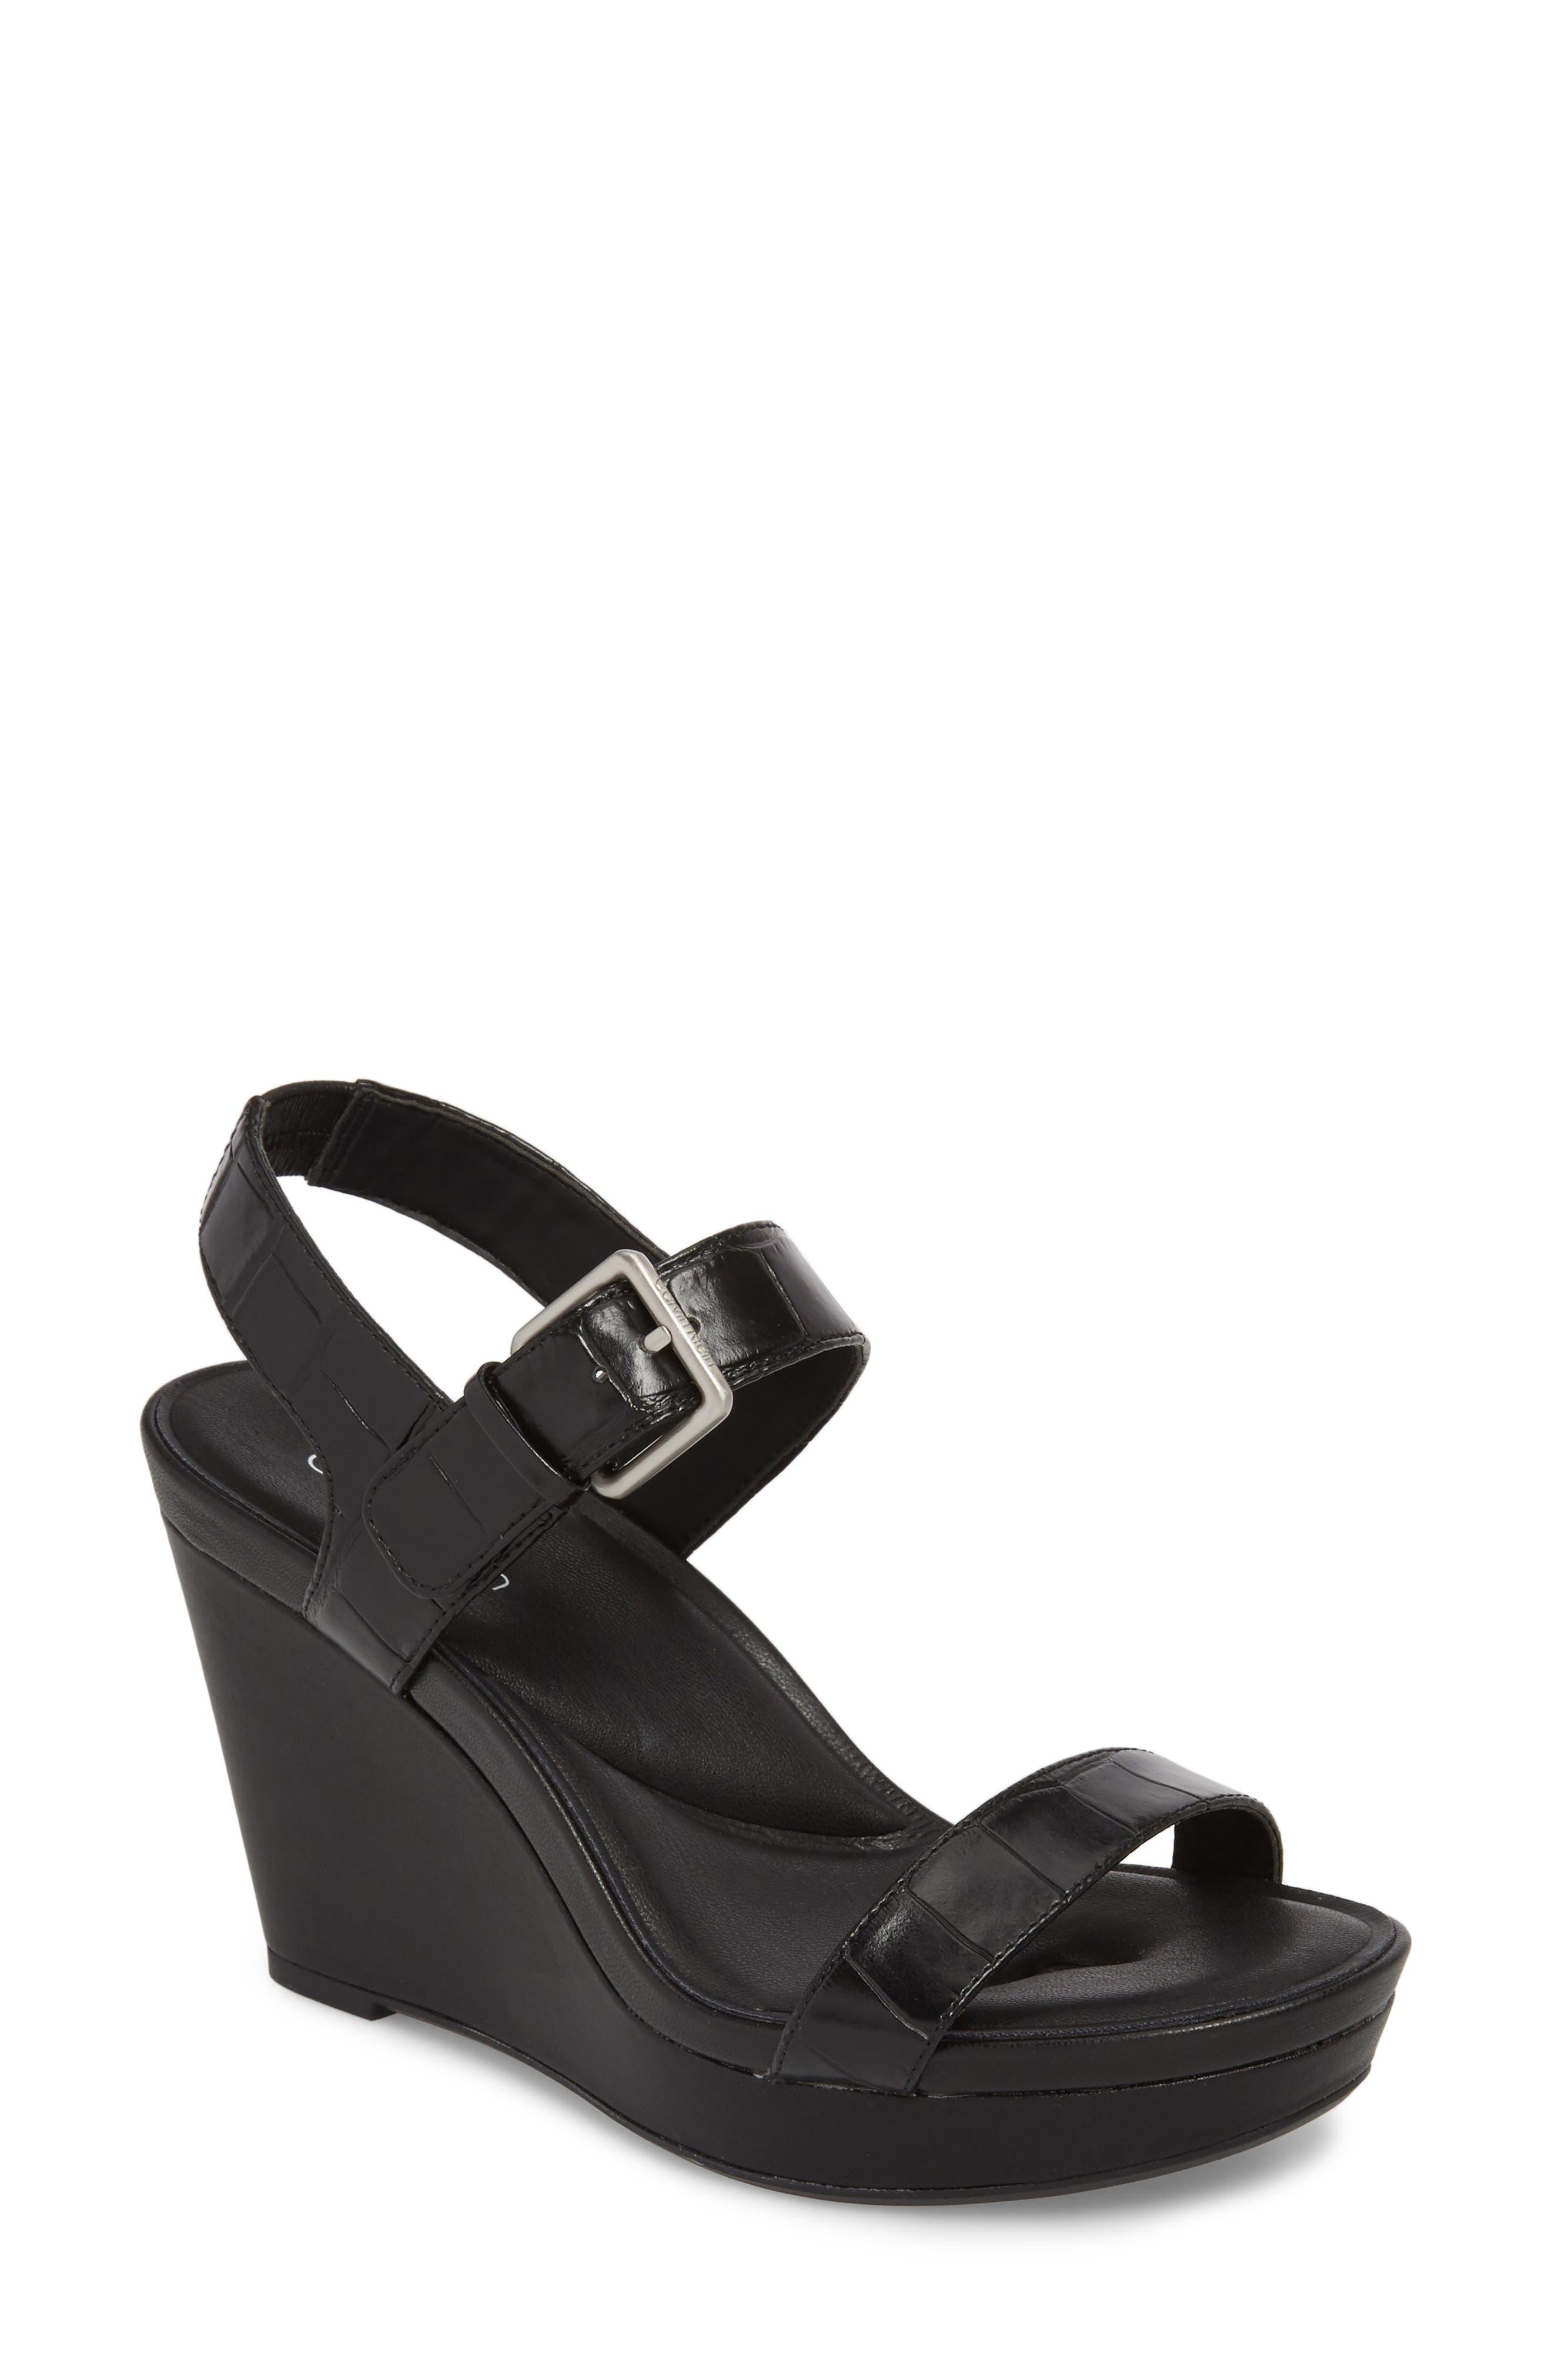 Alternate Image 1 Selected - Calvin Klein Jacie Wedge Sandal (Women)